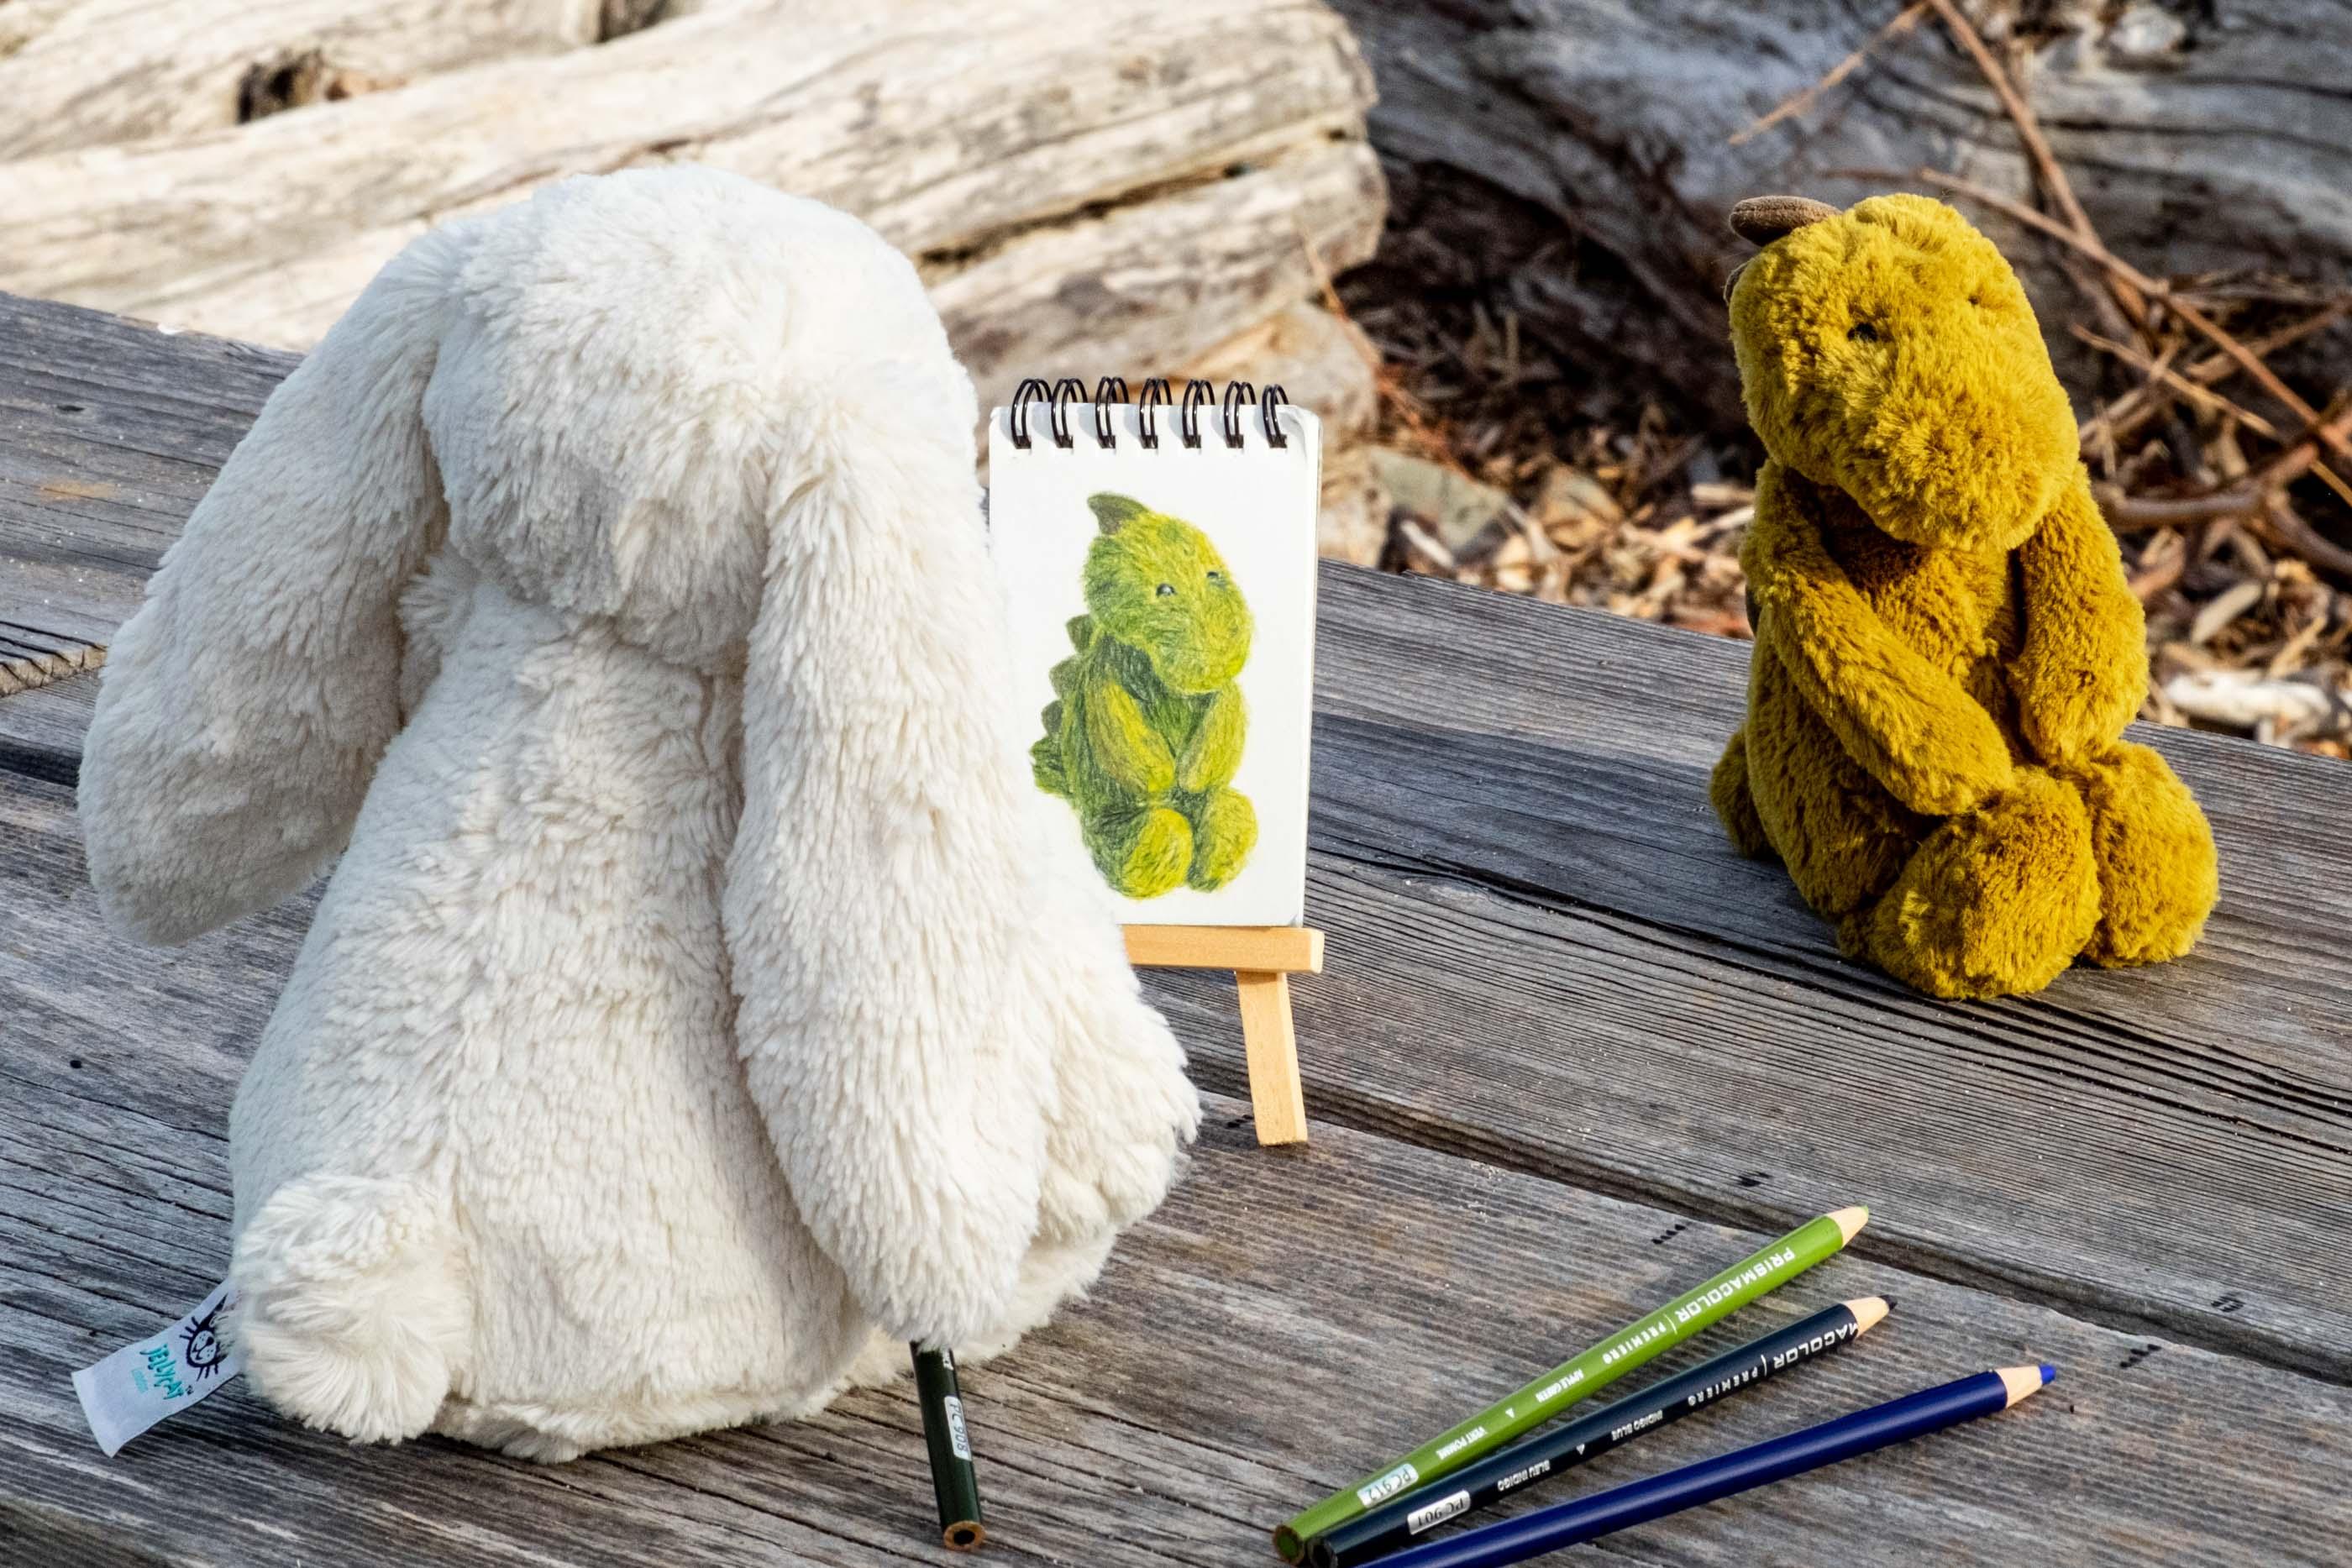 stuffed bunny drawing a portrait of a stuffed dinosaur